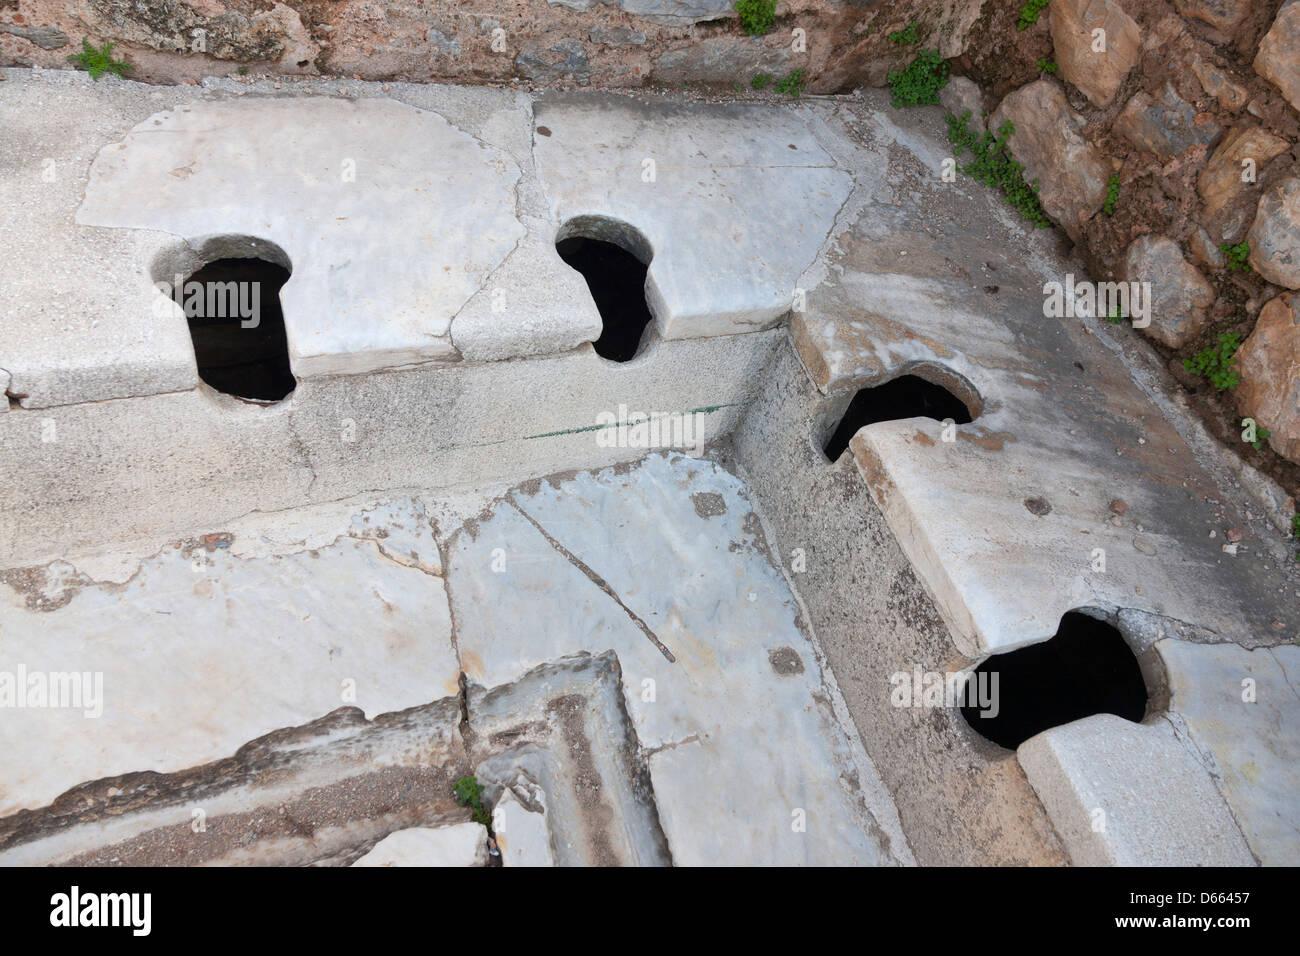 Roman marble toilet seats in the ancient ruined city of Ephesus near Selçuk, Turkey Stock Photo